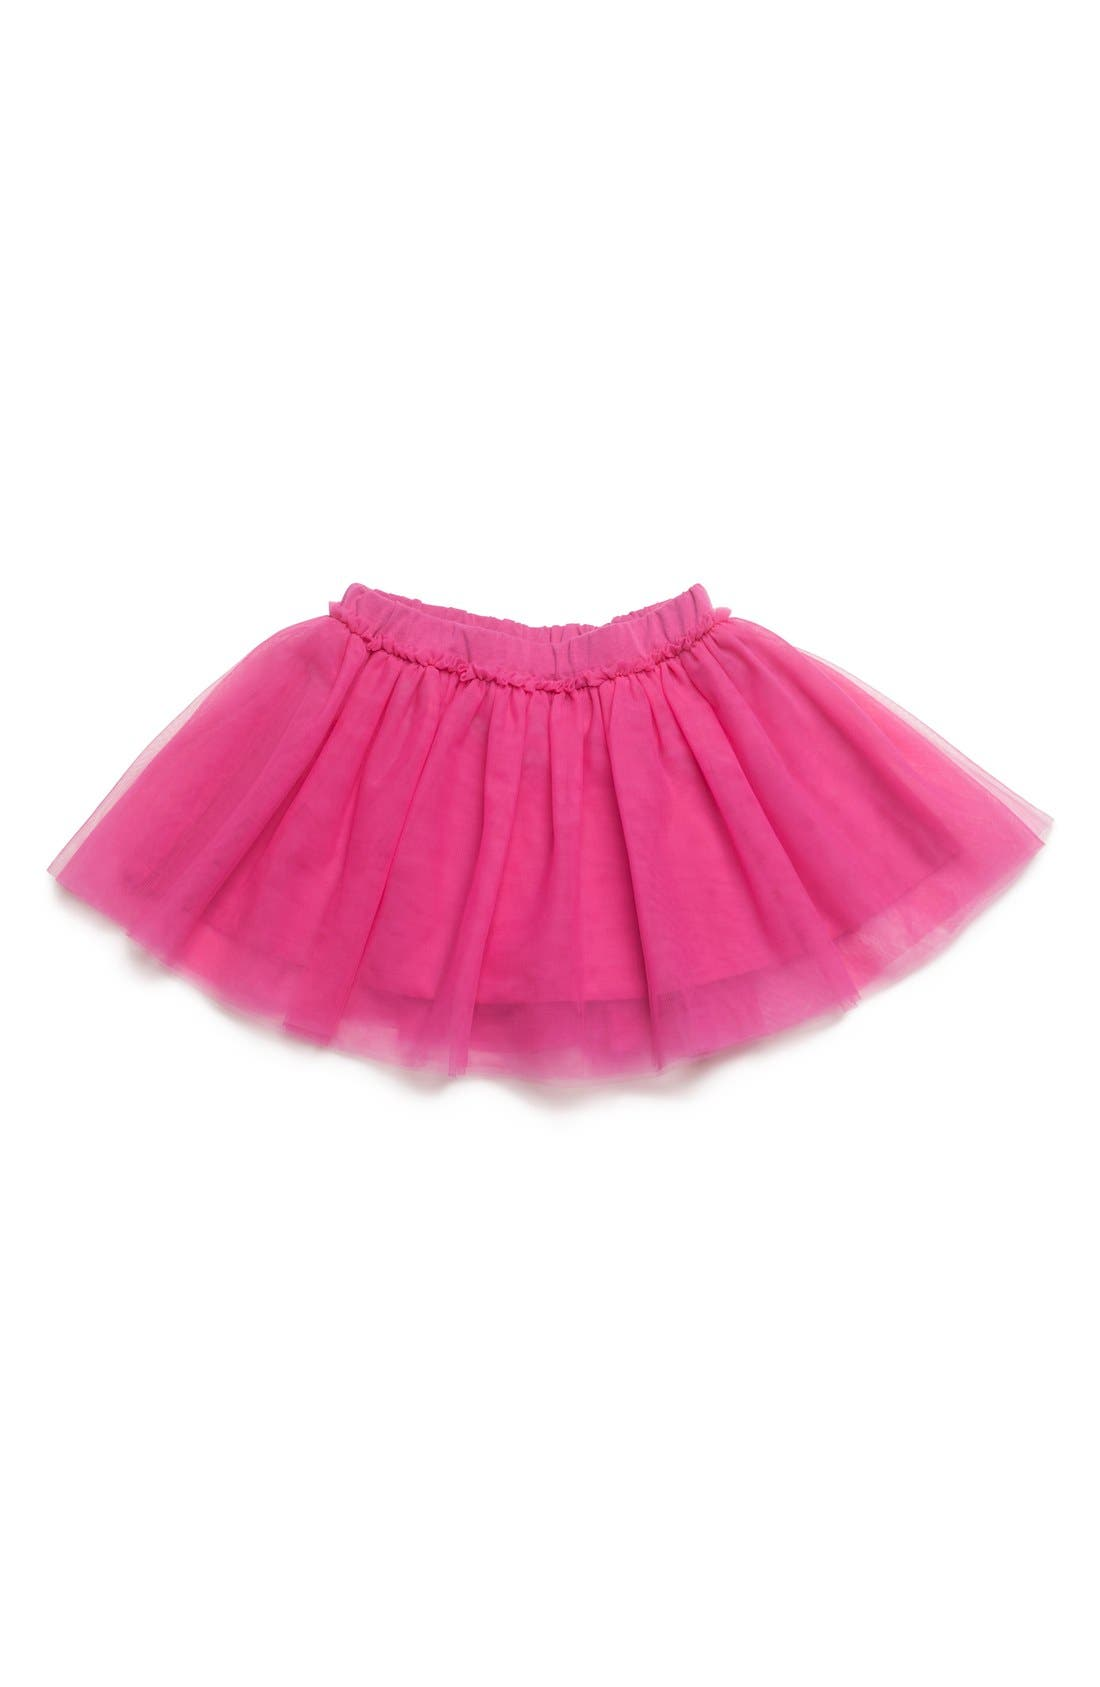 Alternate Image 1 Selected - Monica + Andy Spinning Skirt (Baby Girls)